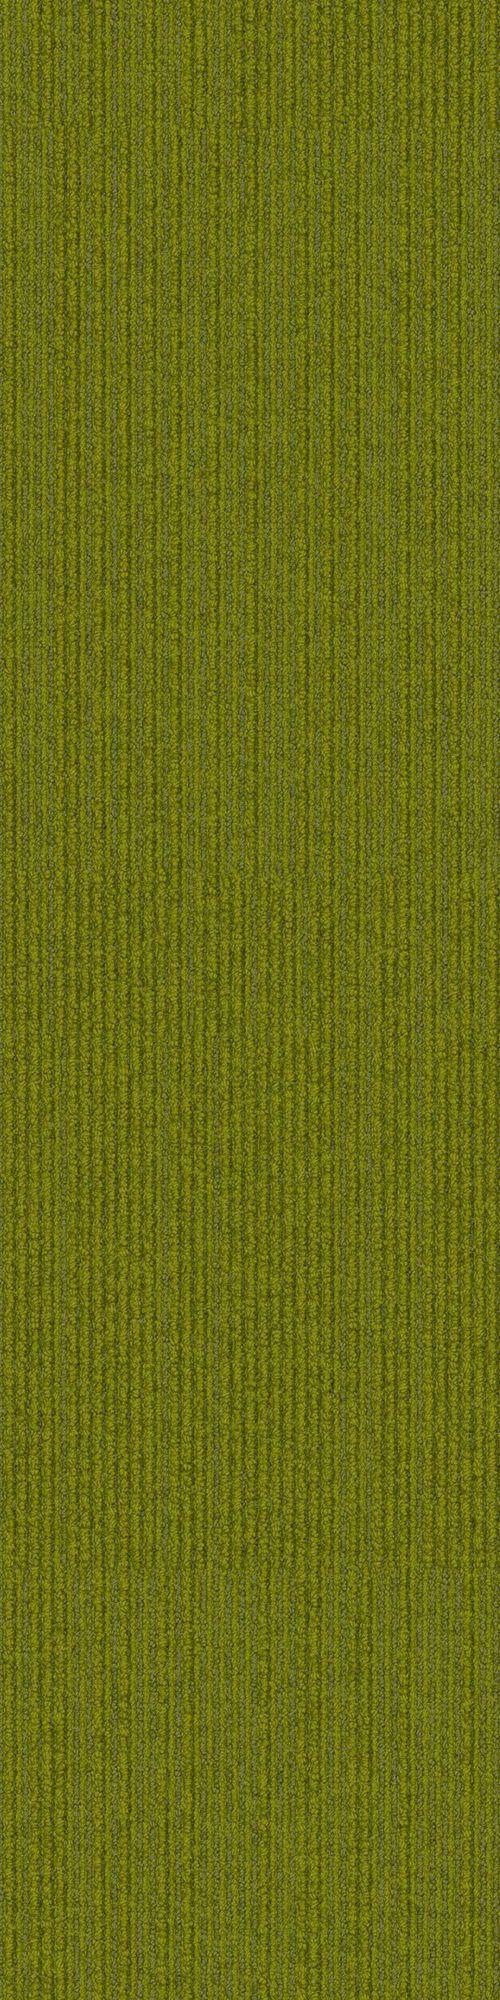 Interface carpet tile: On Line Color name: Lime Variant 3